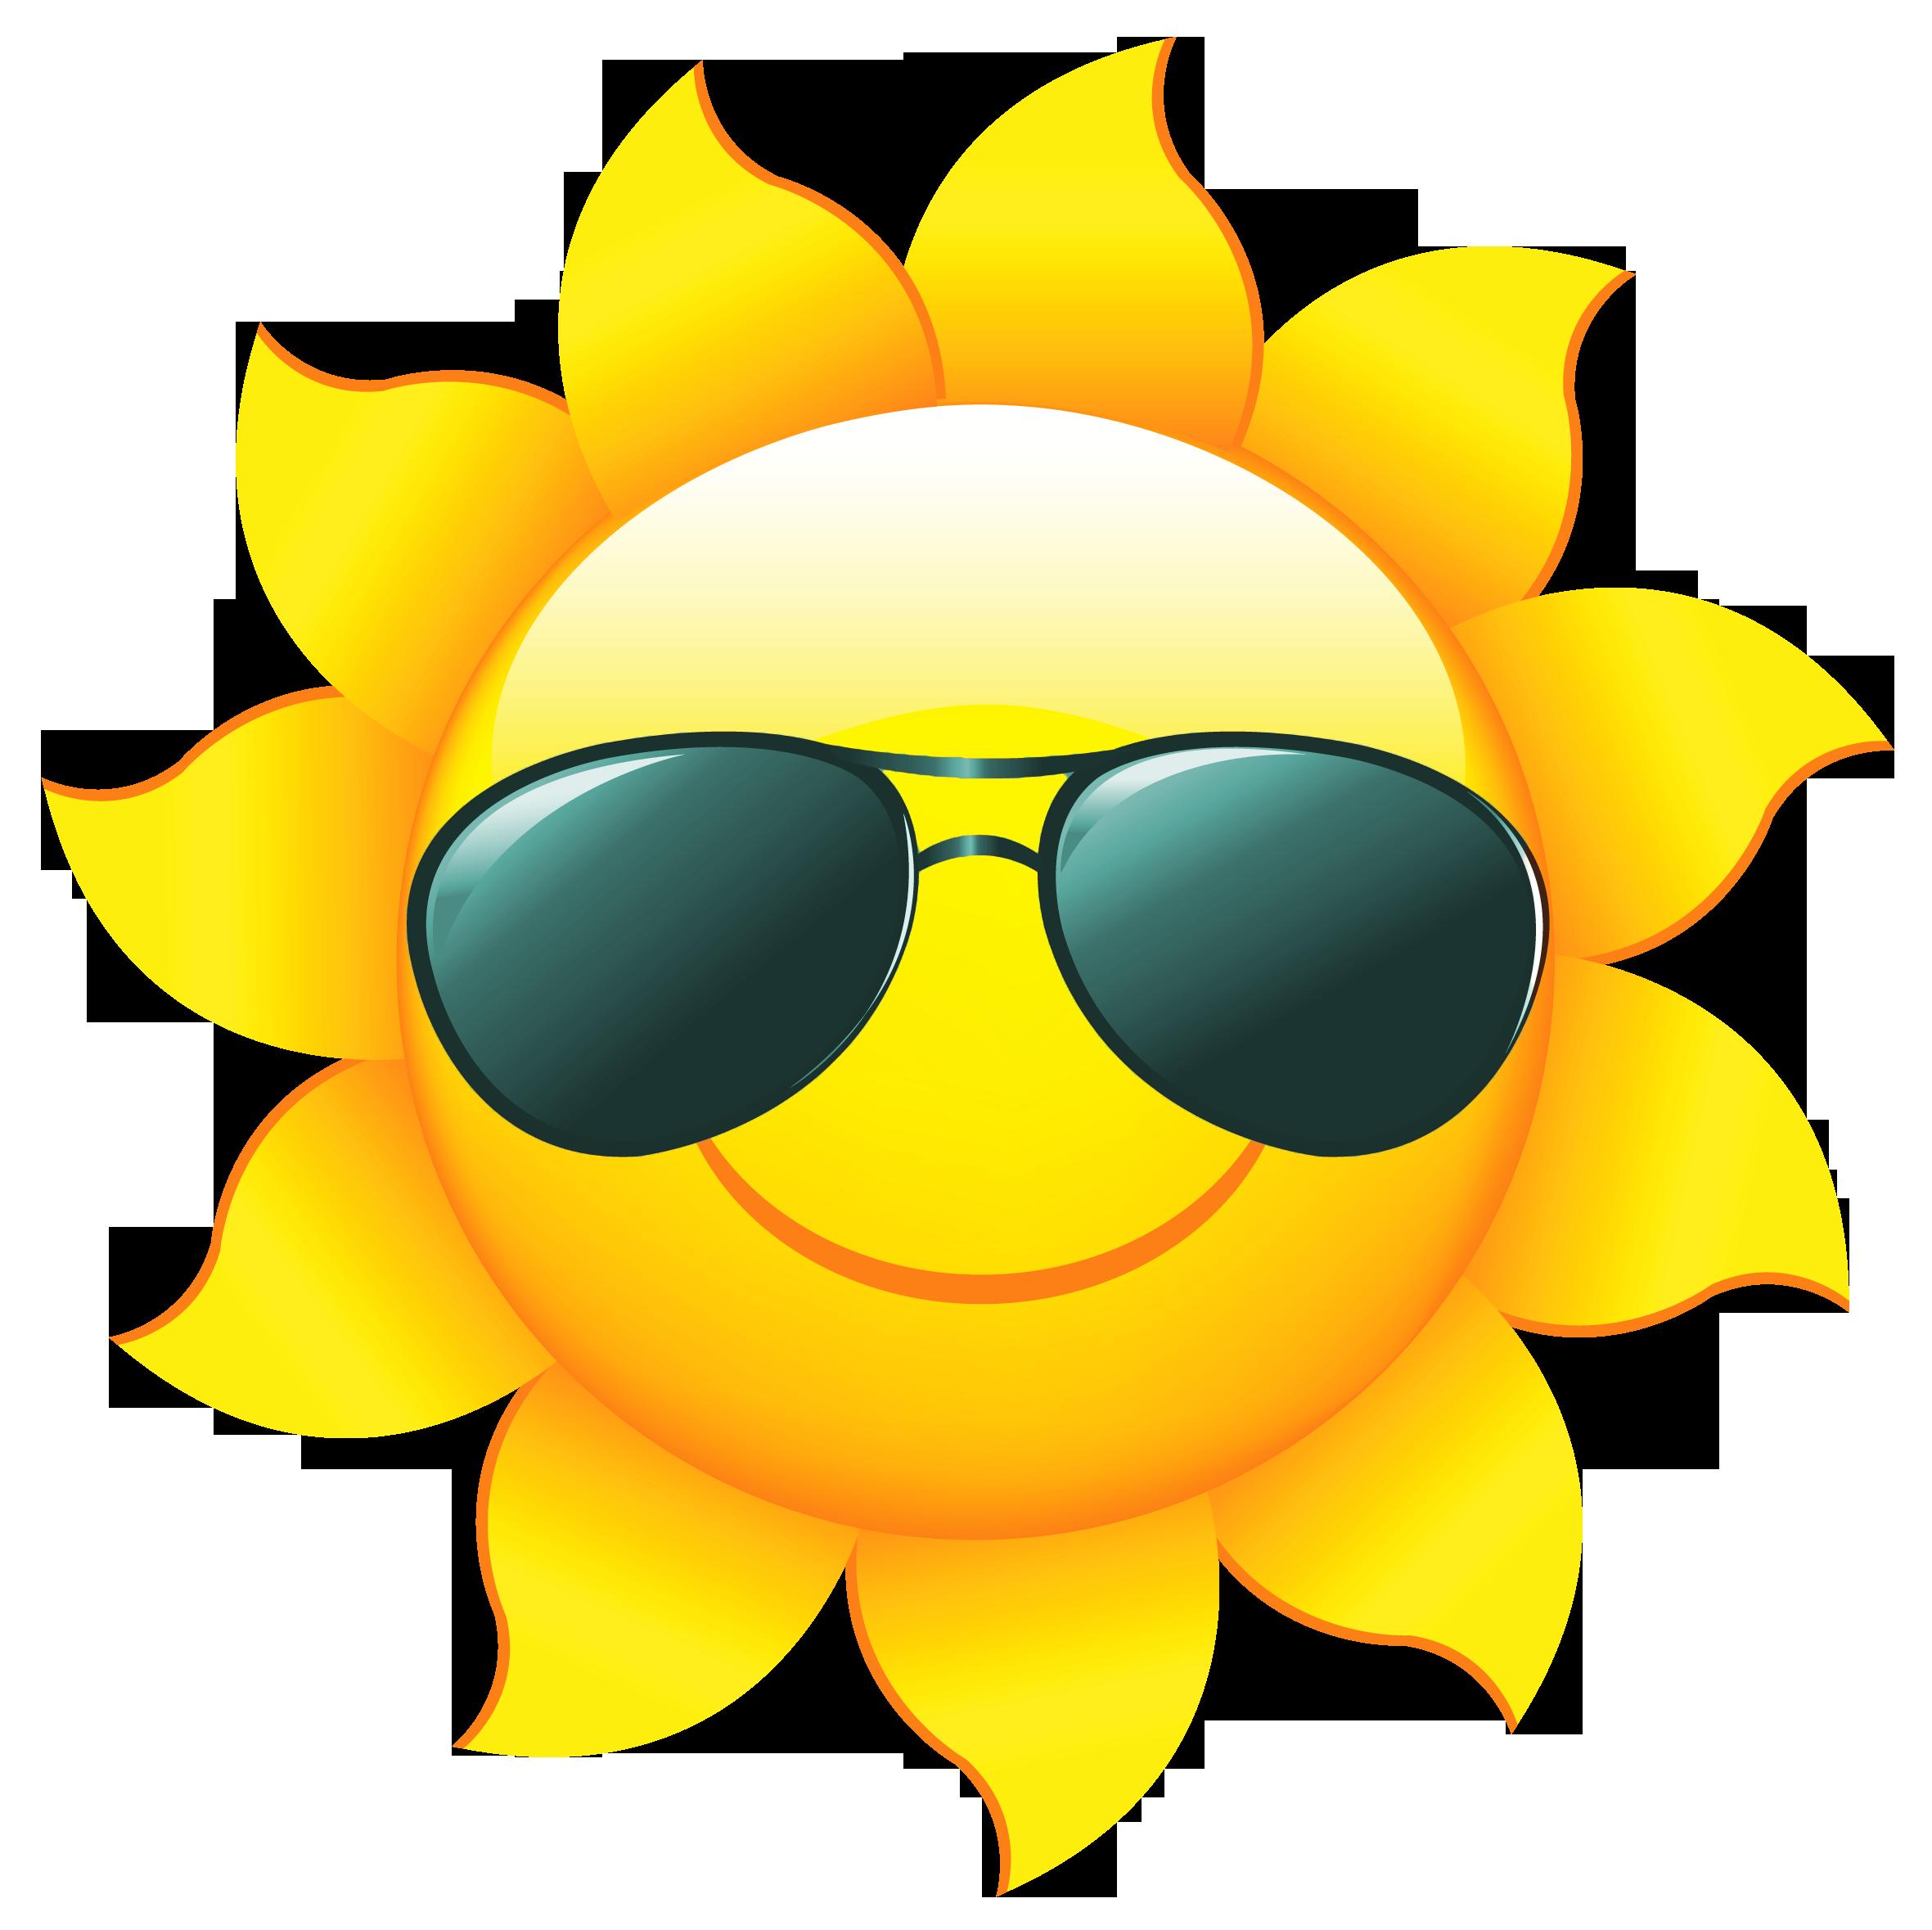 2361x2358 Sunshine Sun Clip Art With Transparent Background Free